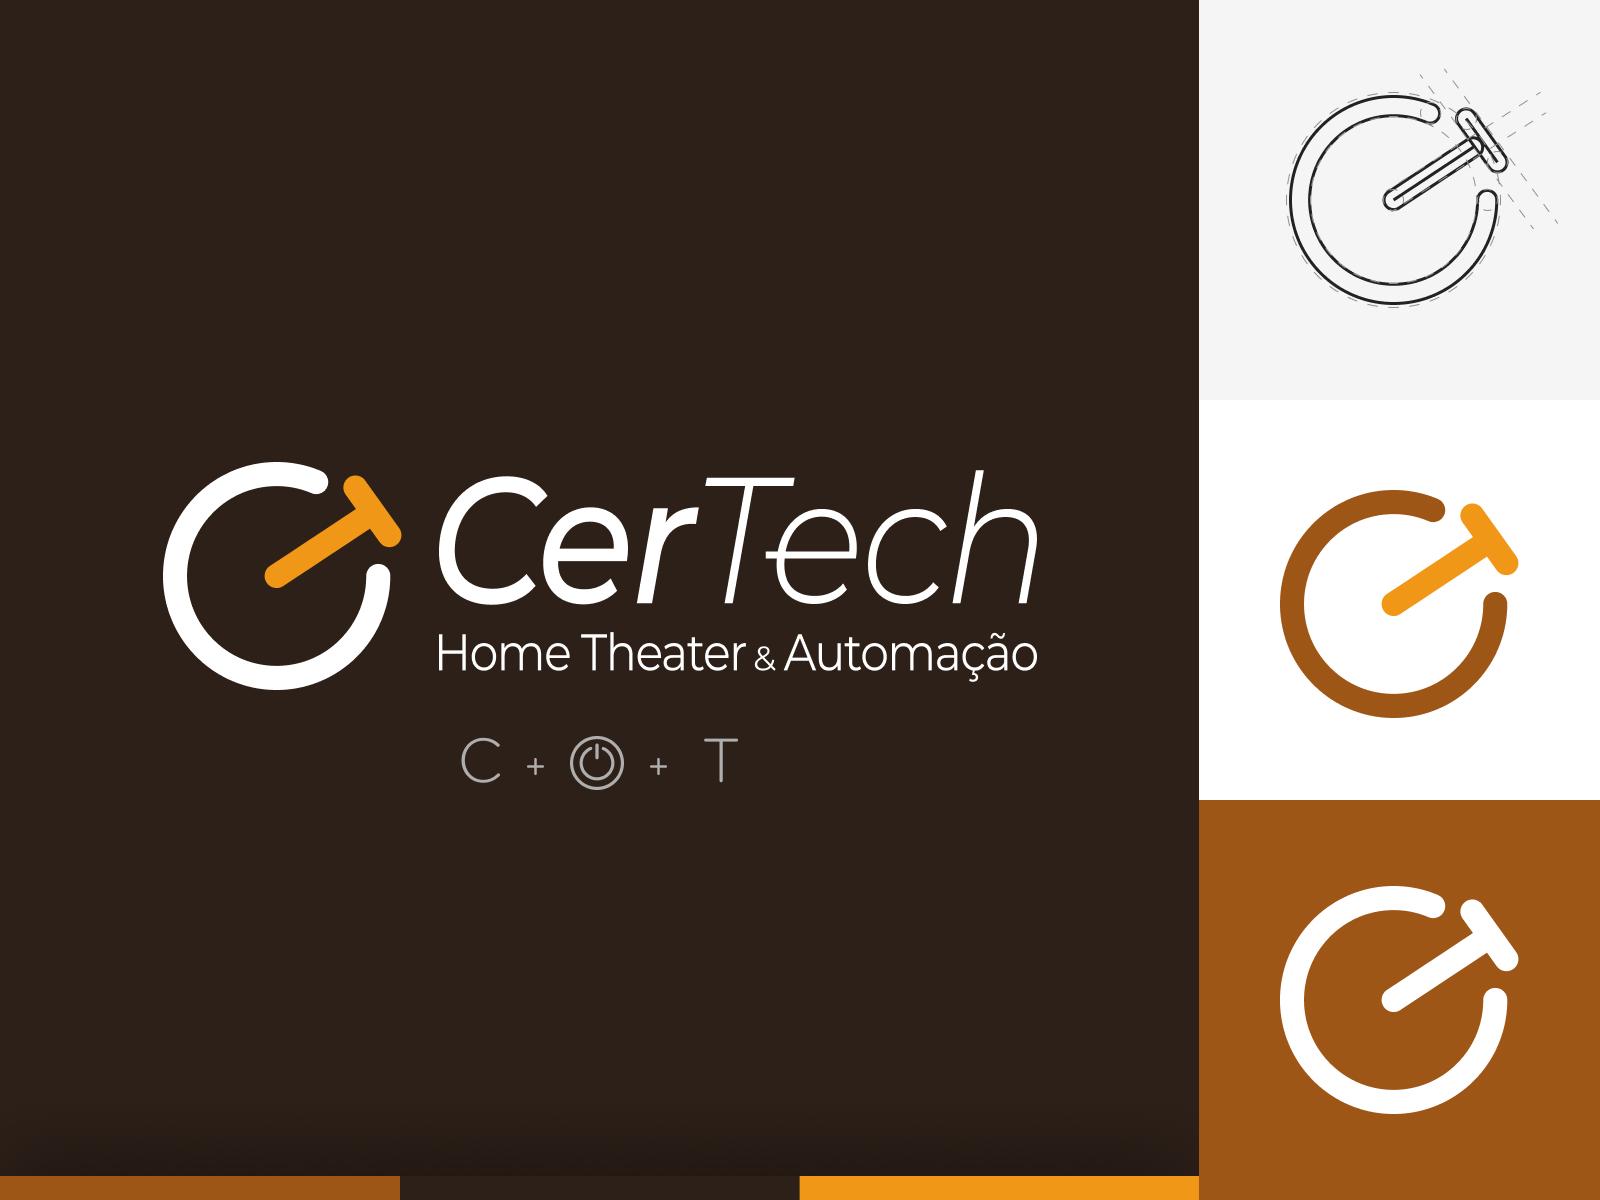 CerTech